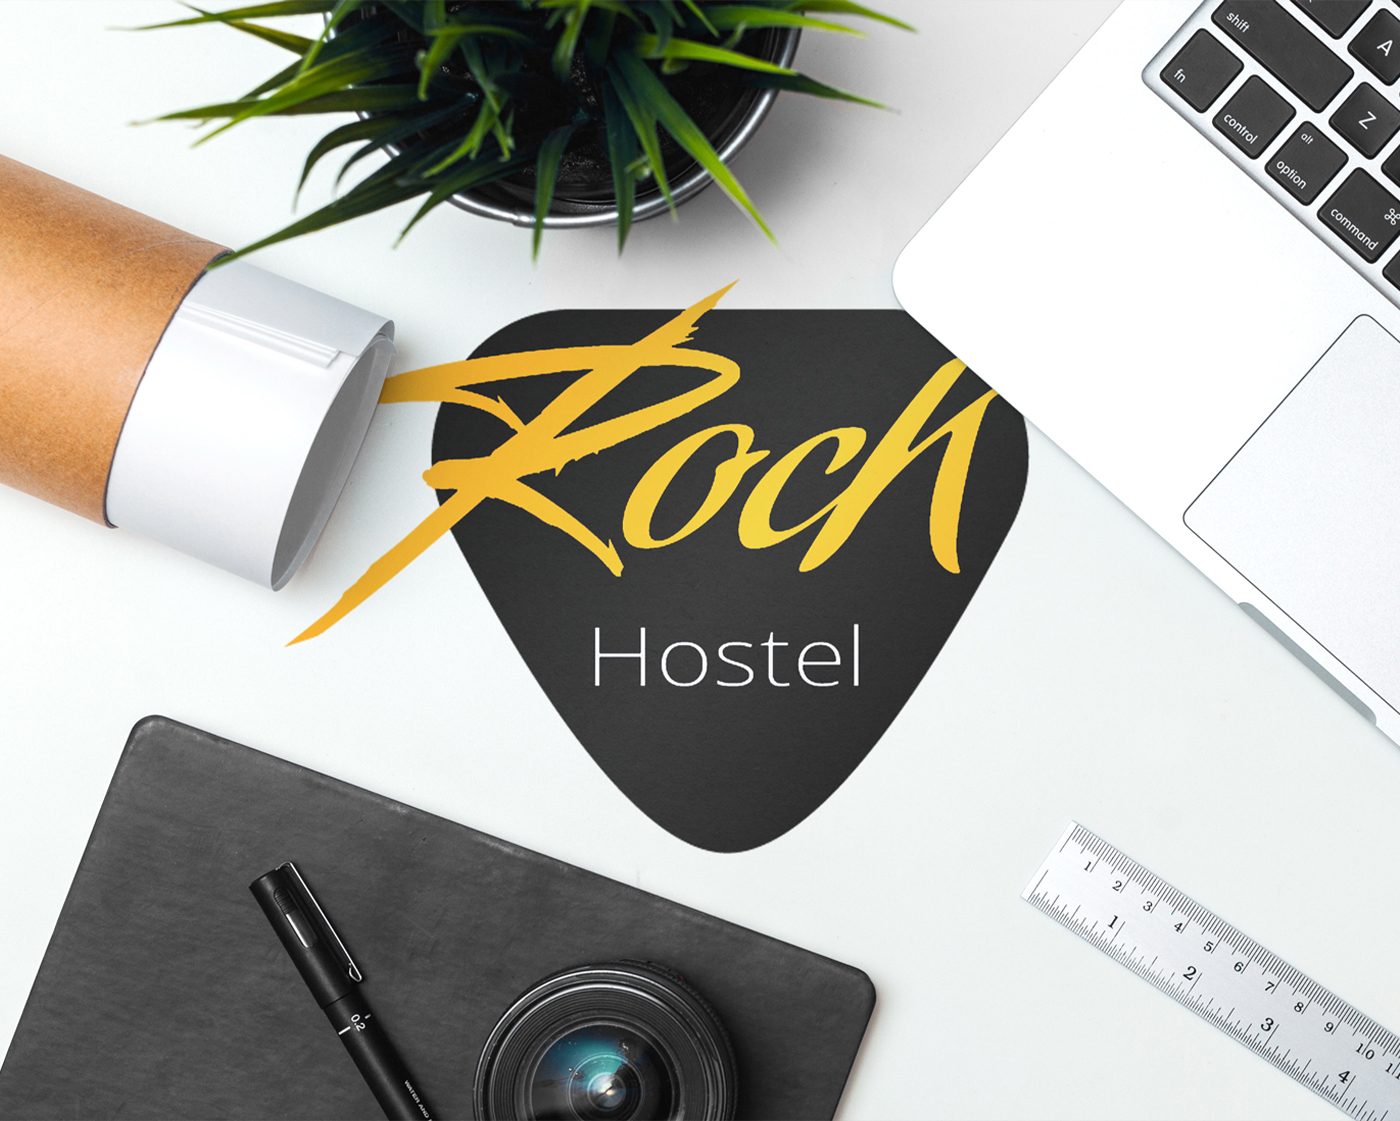 Rock Hostel – Branding